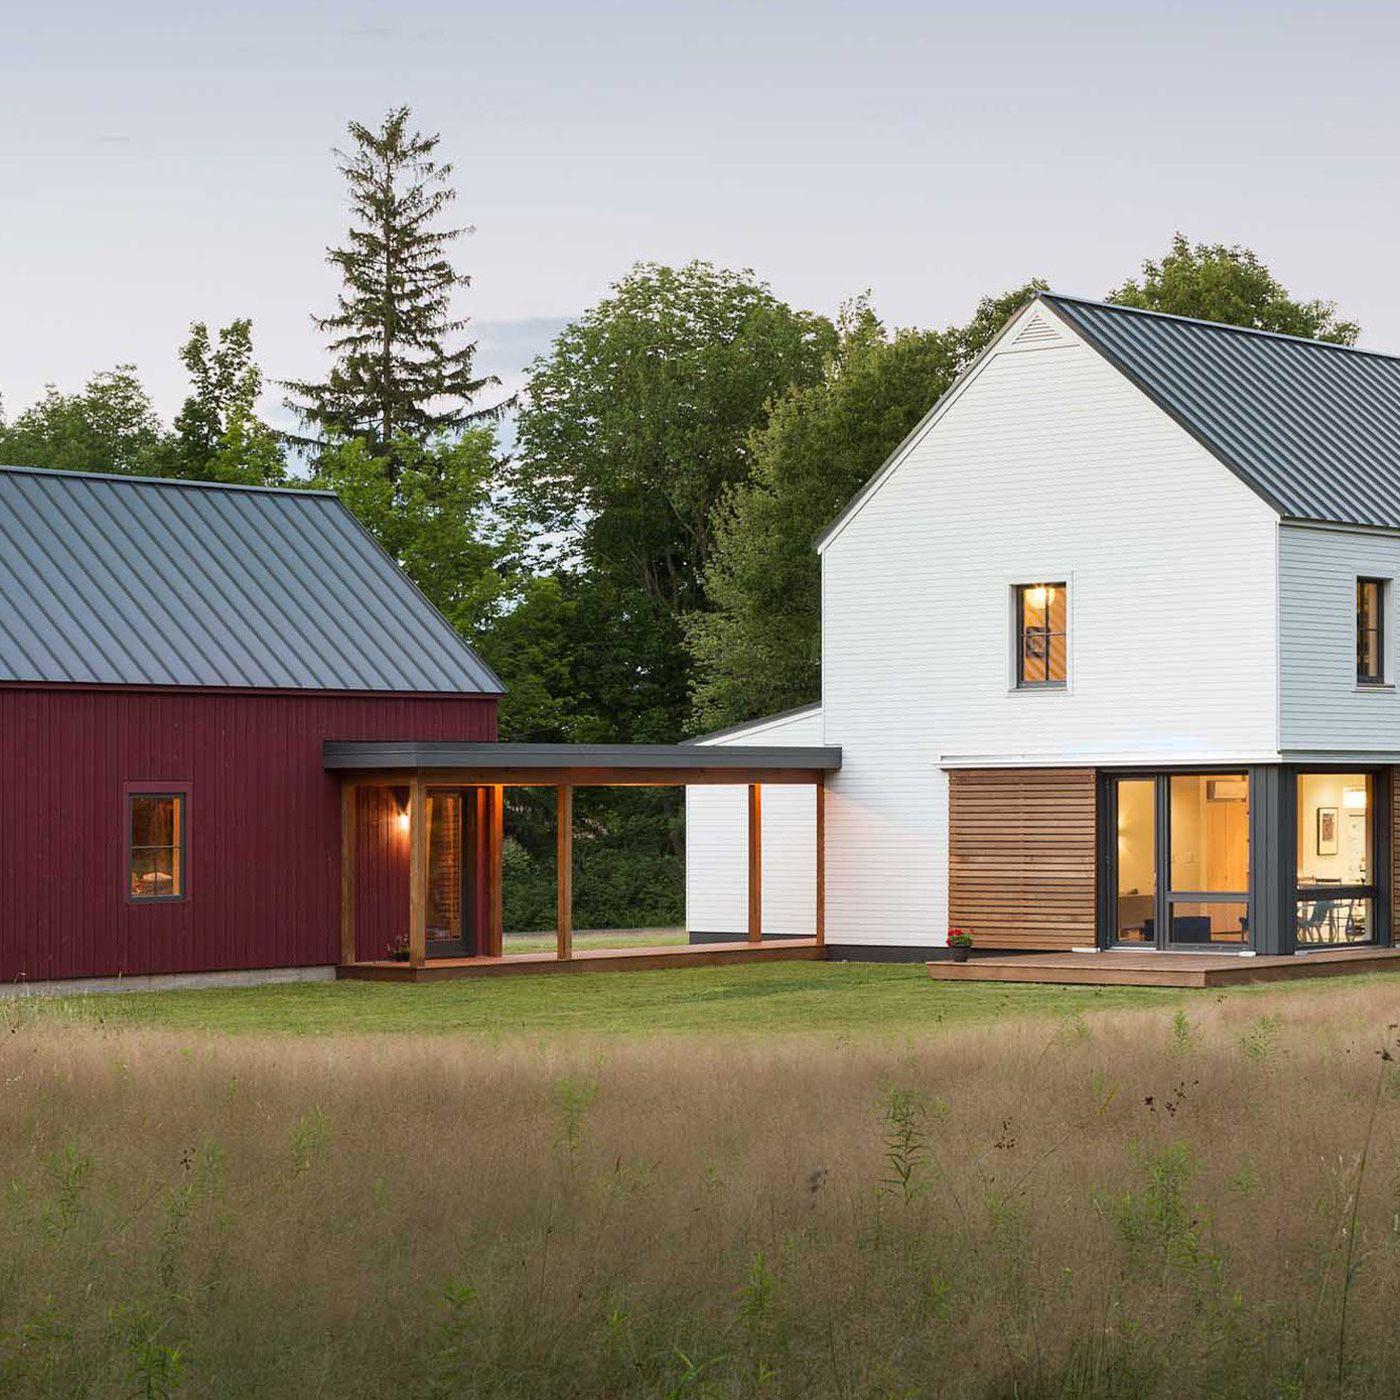 plan home homes ganti cabin s prefab pole cabins racing micro house custom kit kits small barns barn